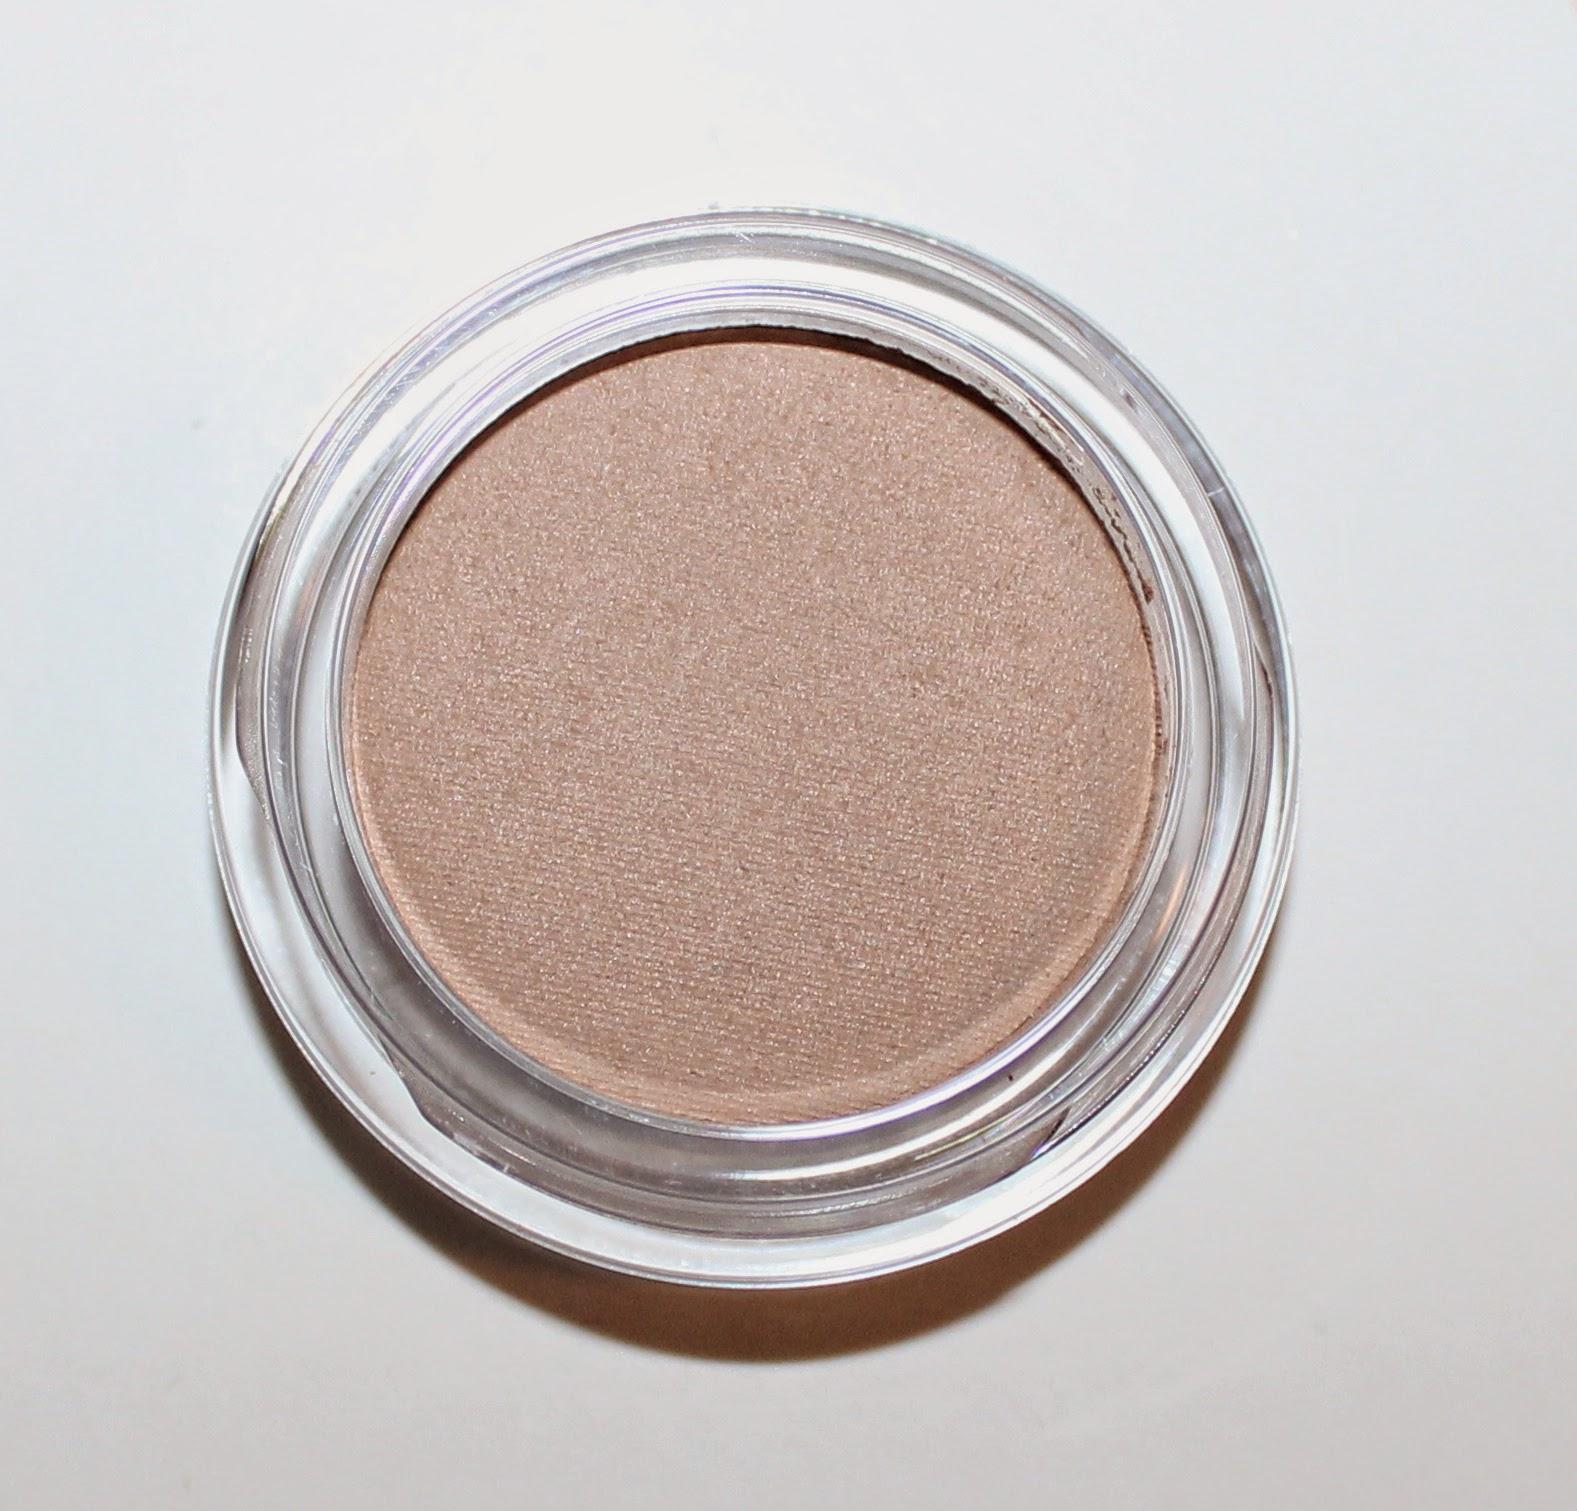 Clarins Ombre Matte Eyeshadow in 01 Nude Beige